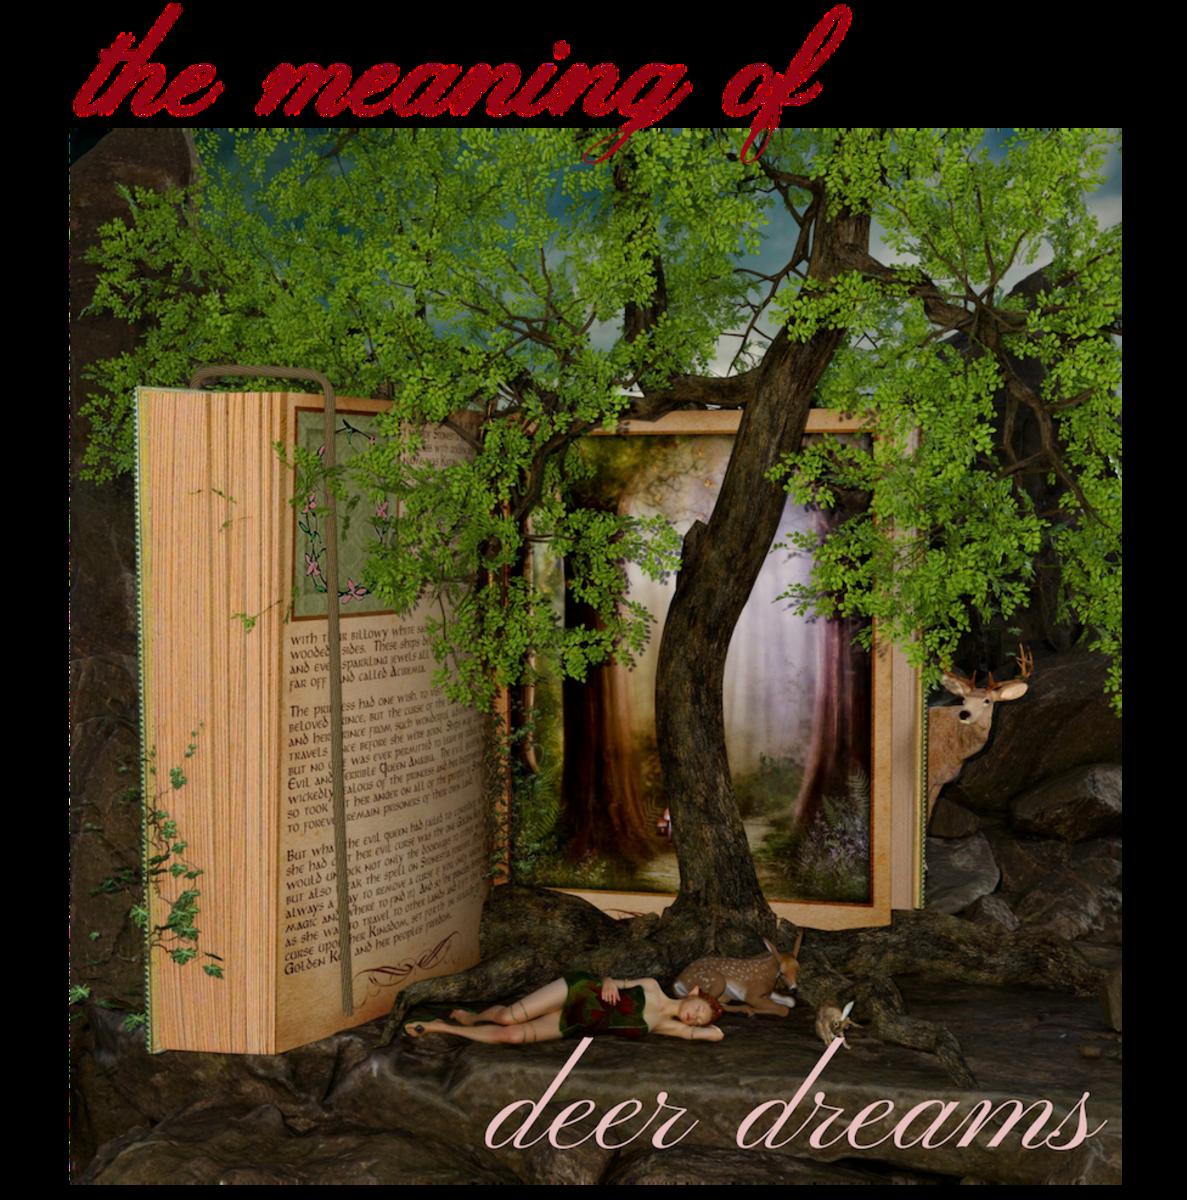 Deer Dream Symbolism: What Do Dreams About Deer Mean